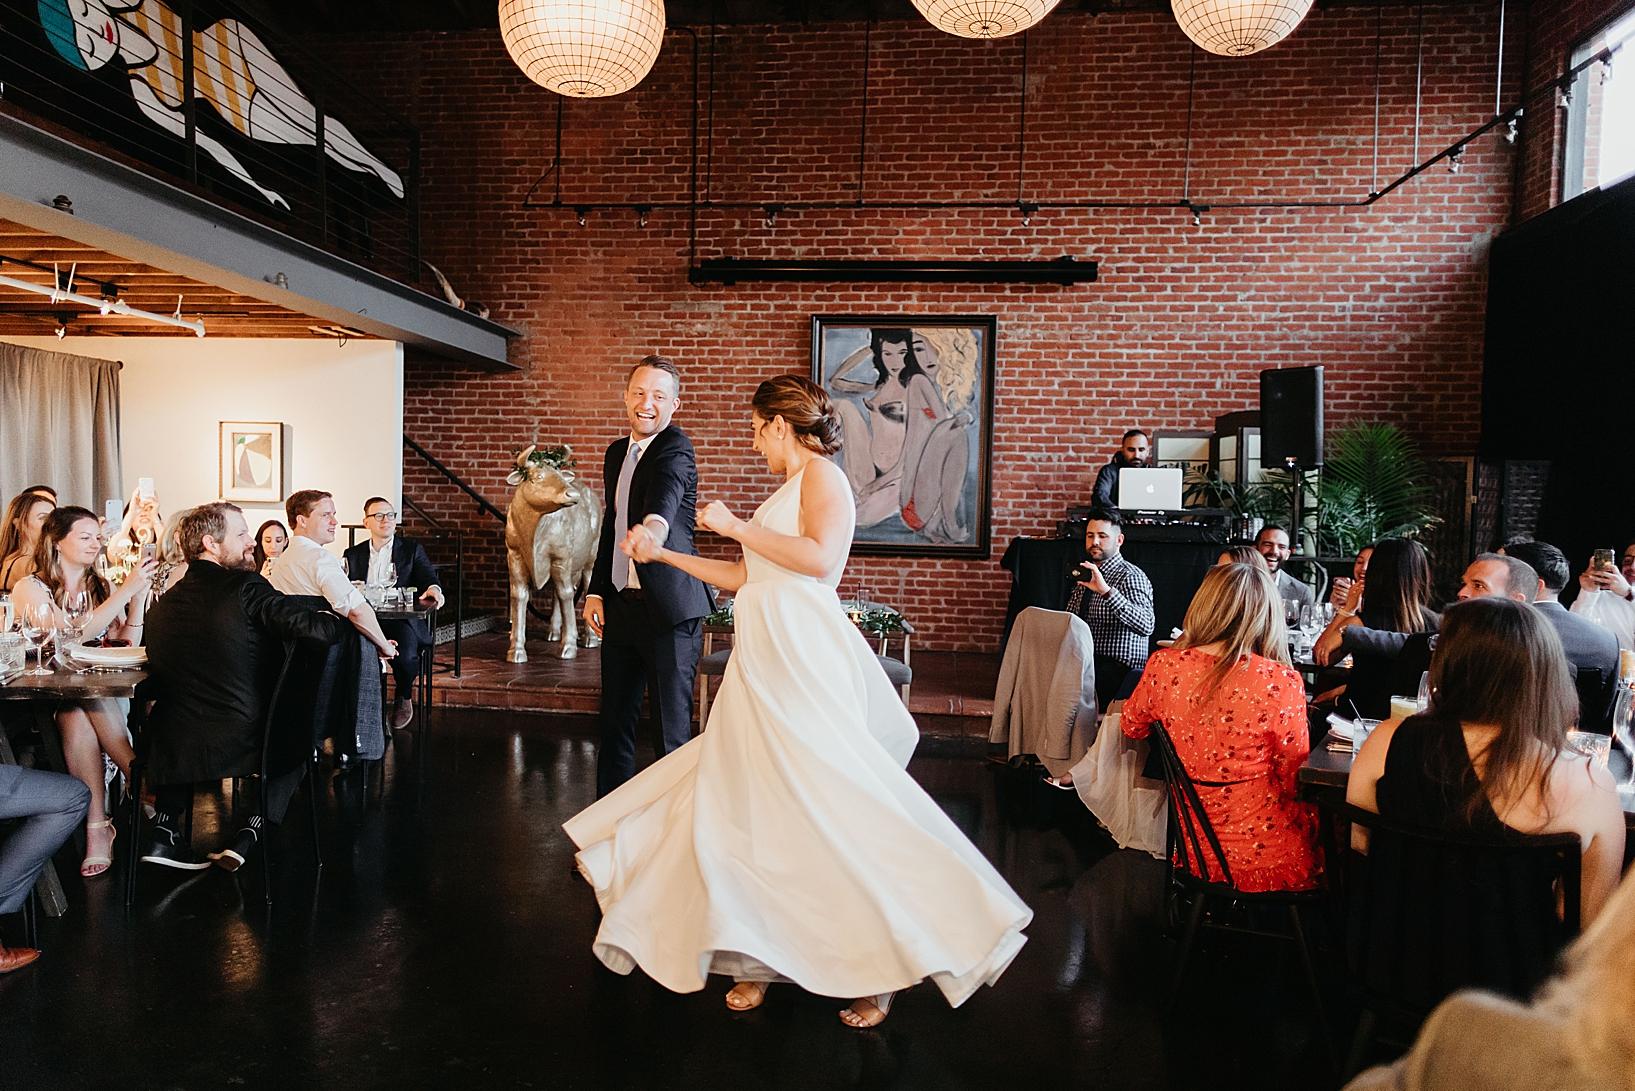 Herb-and-Wood-Wedding-85.jpg